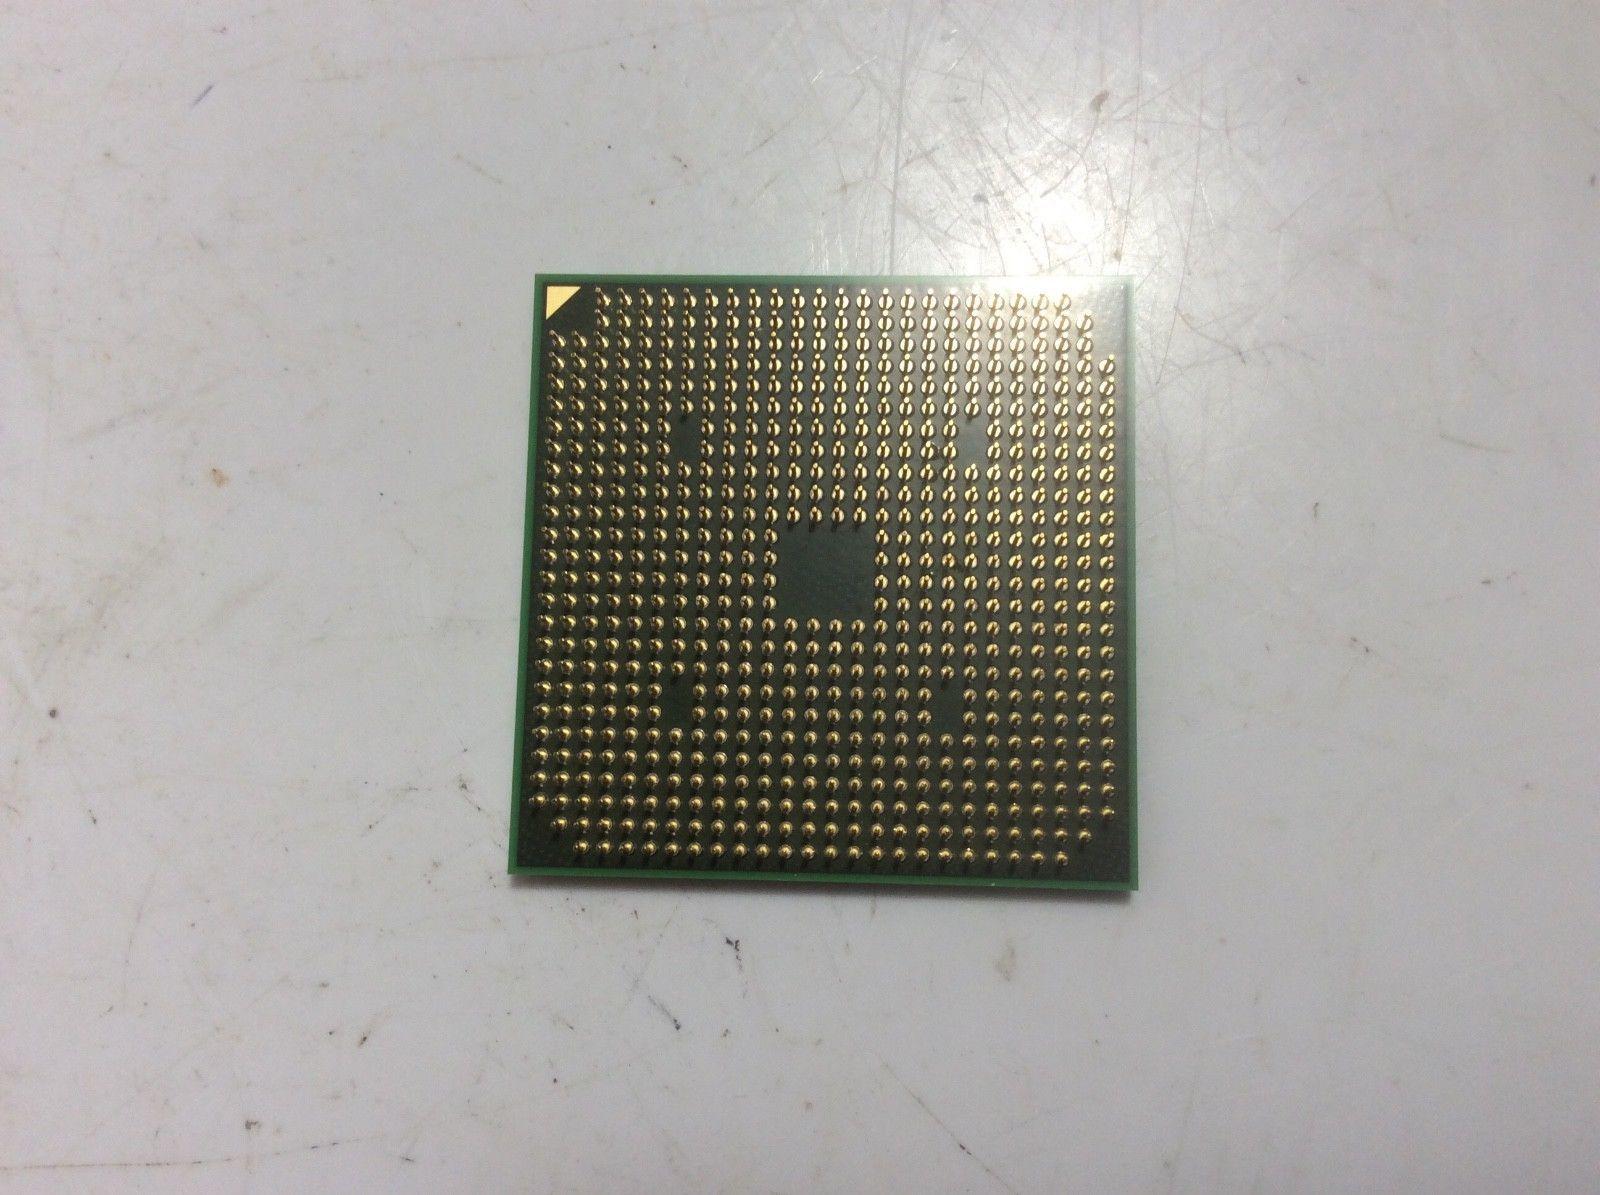 Toshiba L305D-S5934 Laptop 2GHZ DUAL-CORE Turion Processor TMRM70DAM22GK AMD